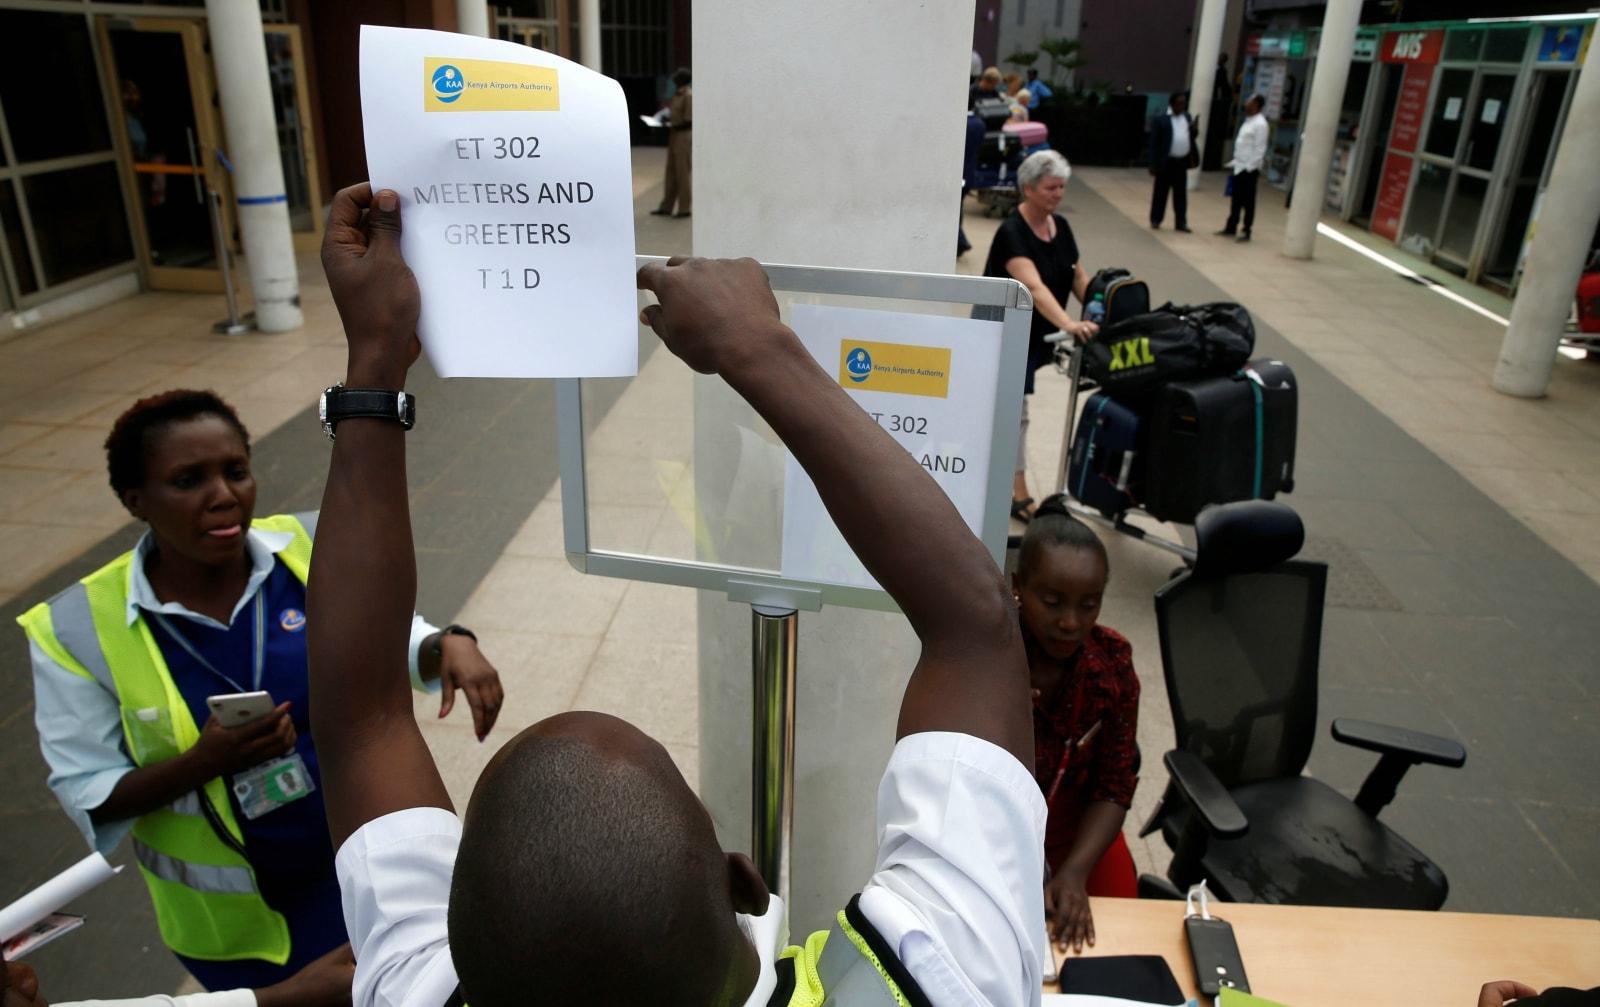 Kenya Airports Authority (KAA) workers hang an information notice of Ethiopian Airlines Flight ET 302, at the Jomo Kenyatta International Airport (JKIA) in Nairobi, Kenya March 10, 2019. REUTERS/Baz Ratner